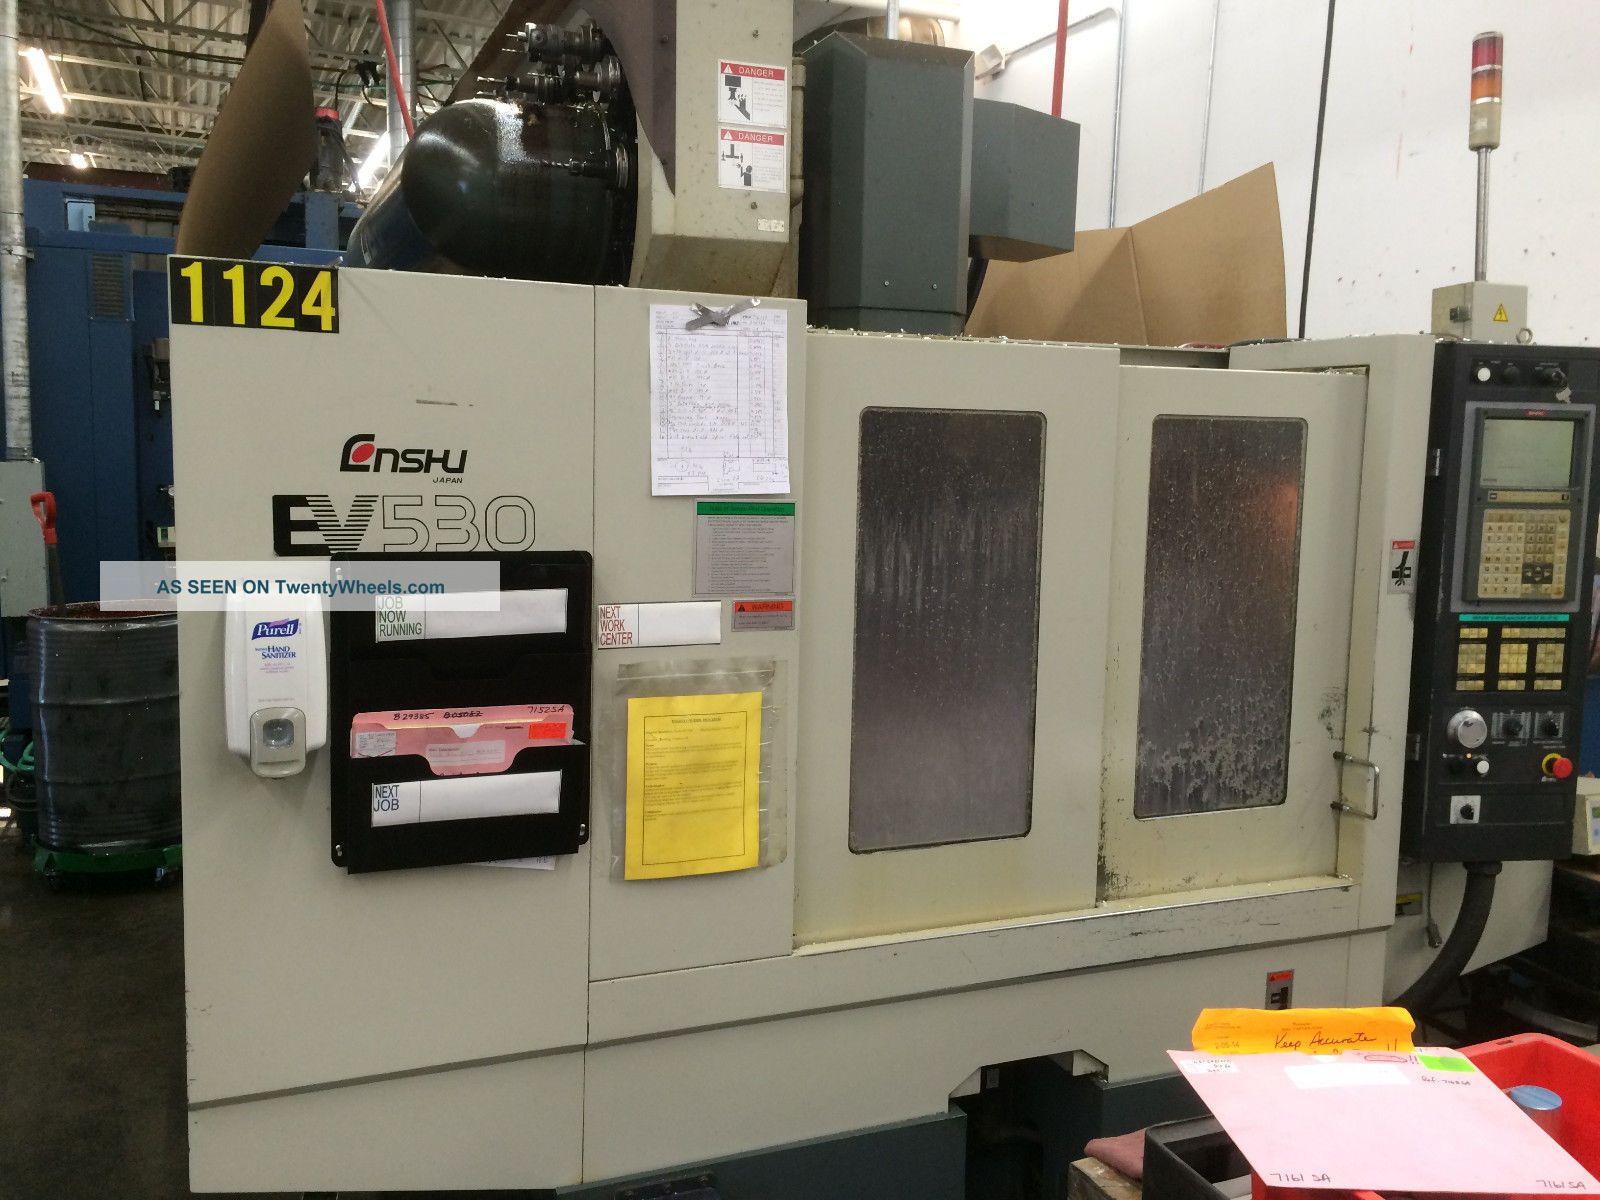 Enshu Ev530 Vertical Machining Center (2000) Milling Machines photo